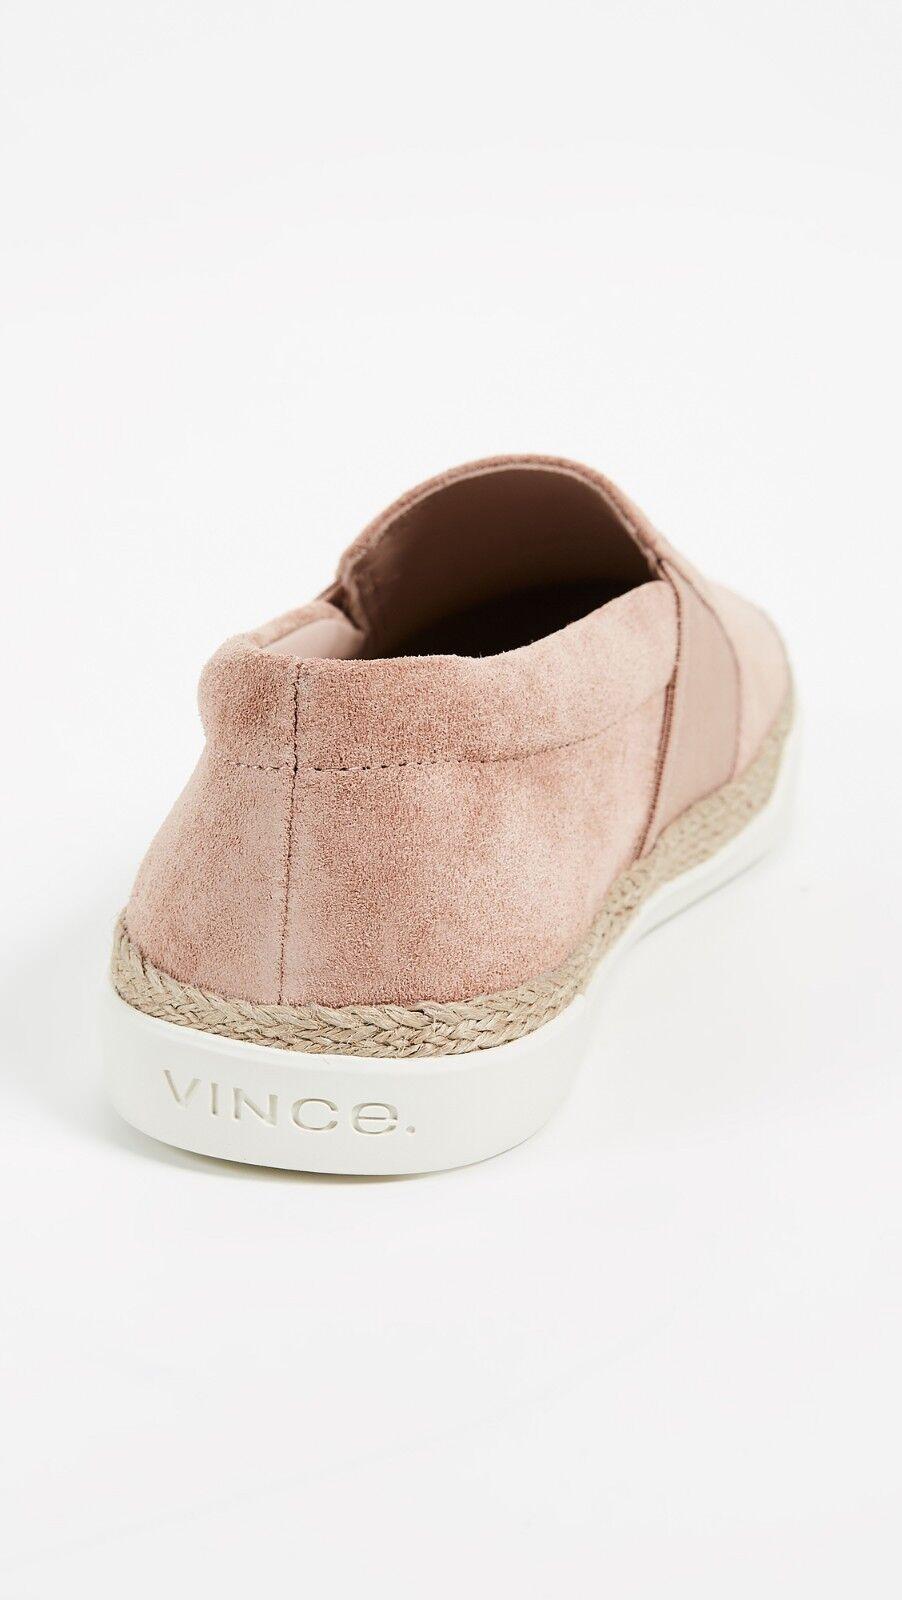 NIB Vince Johan Johan Johan Suede Slip On Sneakers bluesh  225 488332